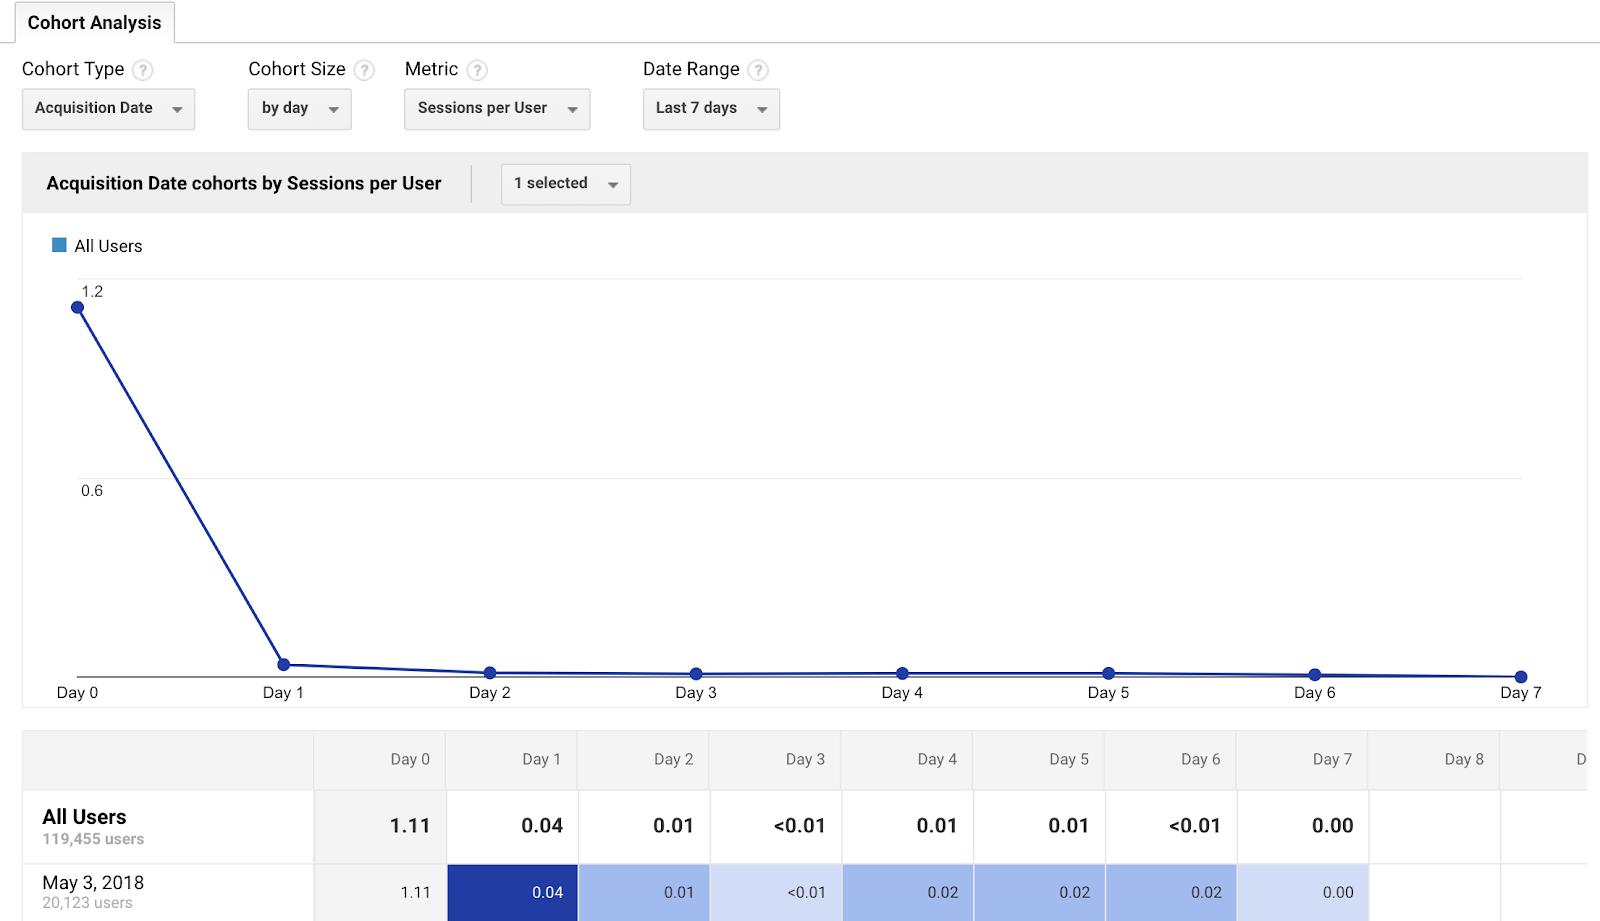 Cómo hacer un análisis de cohorte en Google Analytics para segmentar mejor tu tráfico - fUIvLdWUs5p1cjjeQ7LRuIgCRUIIEU6QM43kfVCsACdDAg8i6WAcjVLeJv6OCPNdRCEjvZQQm26ZyME95W43L8SV5gByBLkJluS5nzCjGxaOeQqJz8SPdip1grZ g9CPazAZpi98